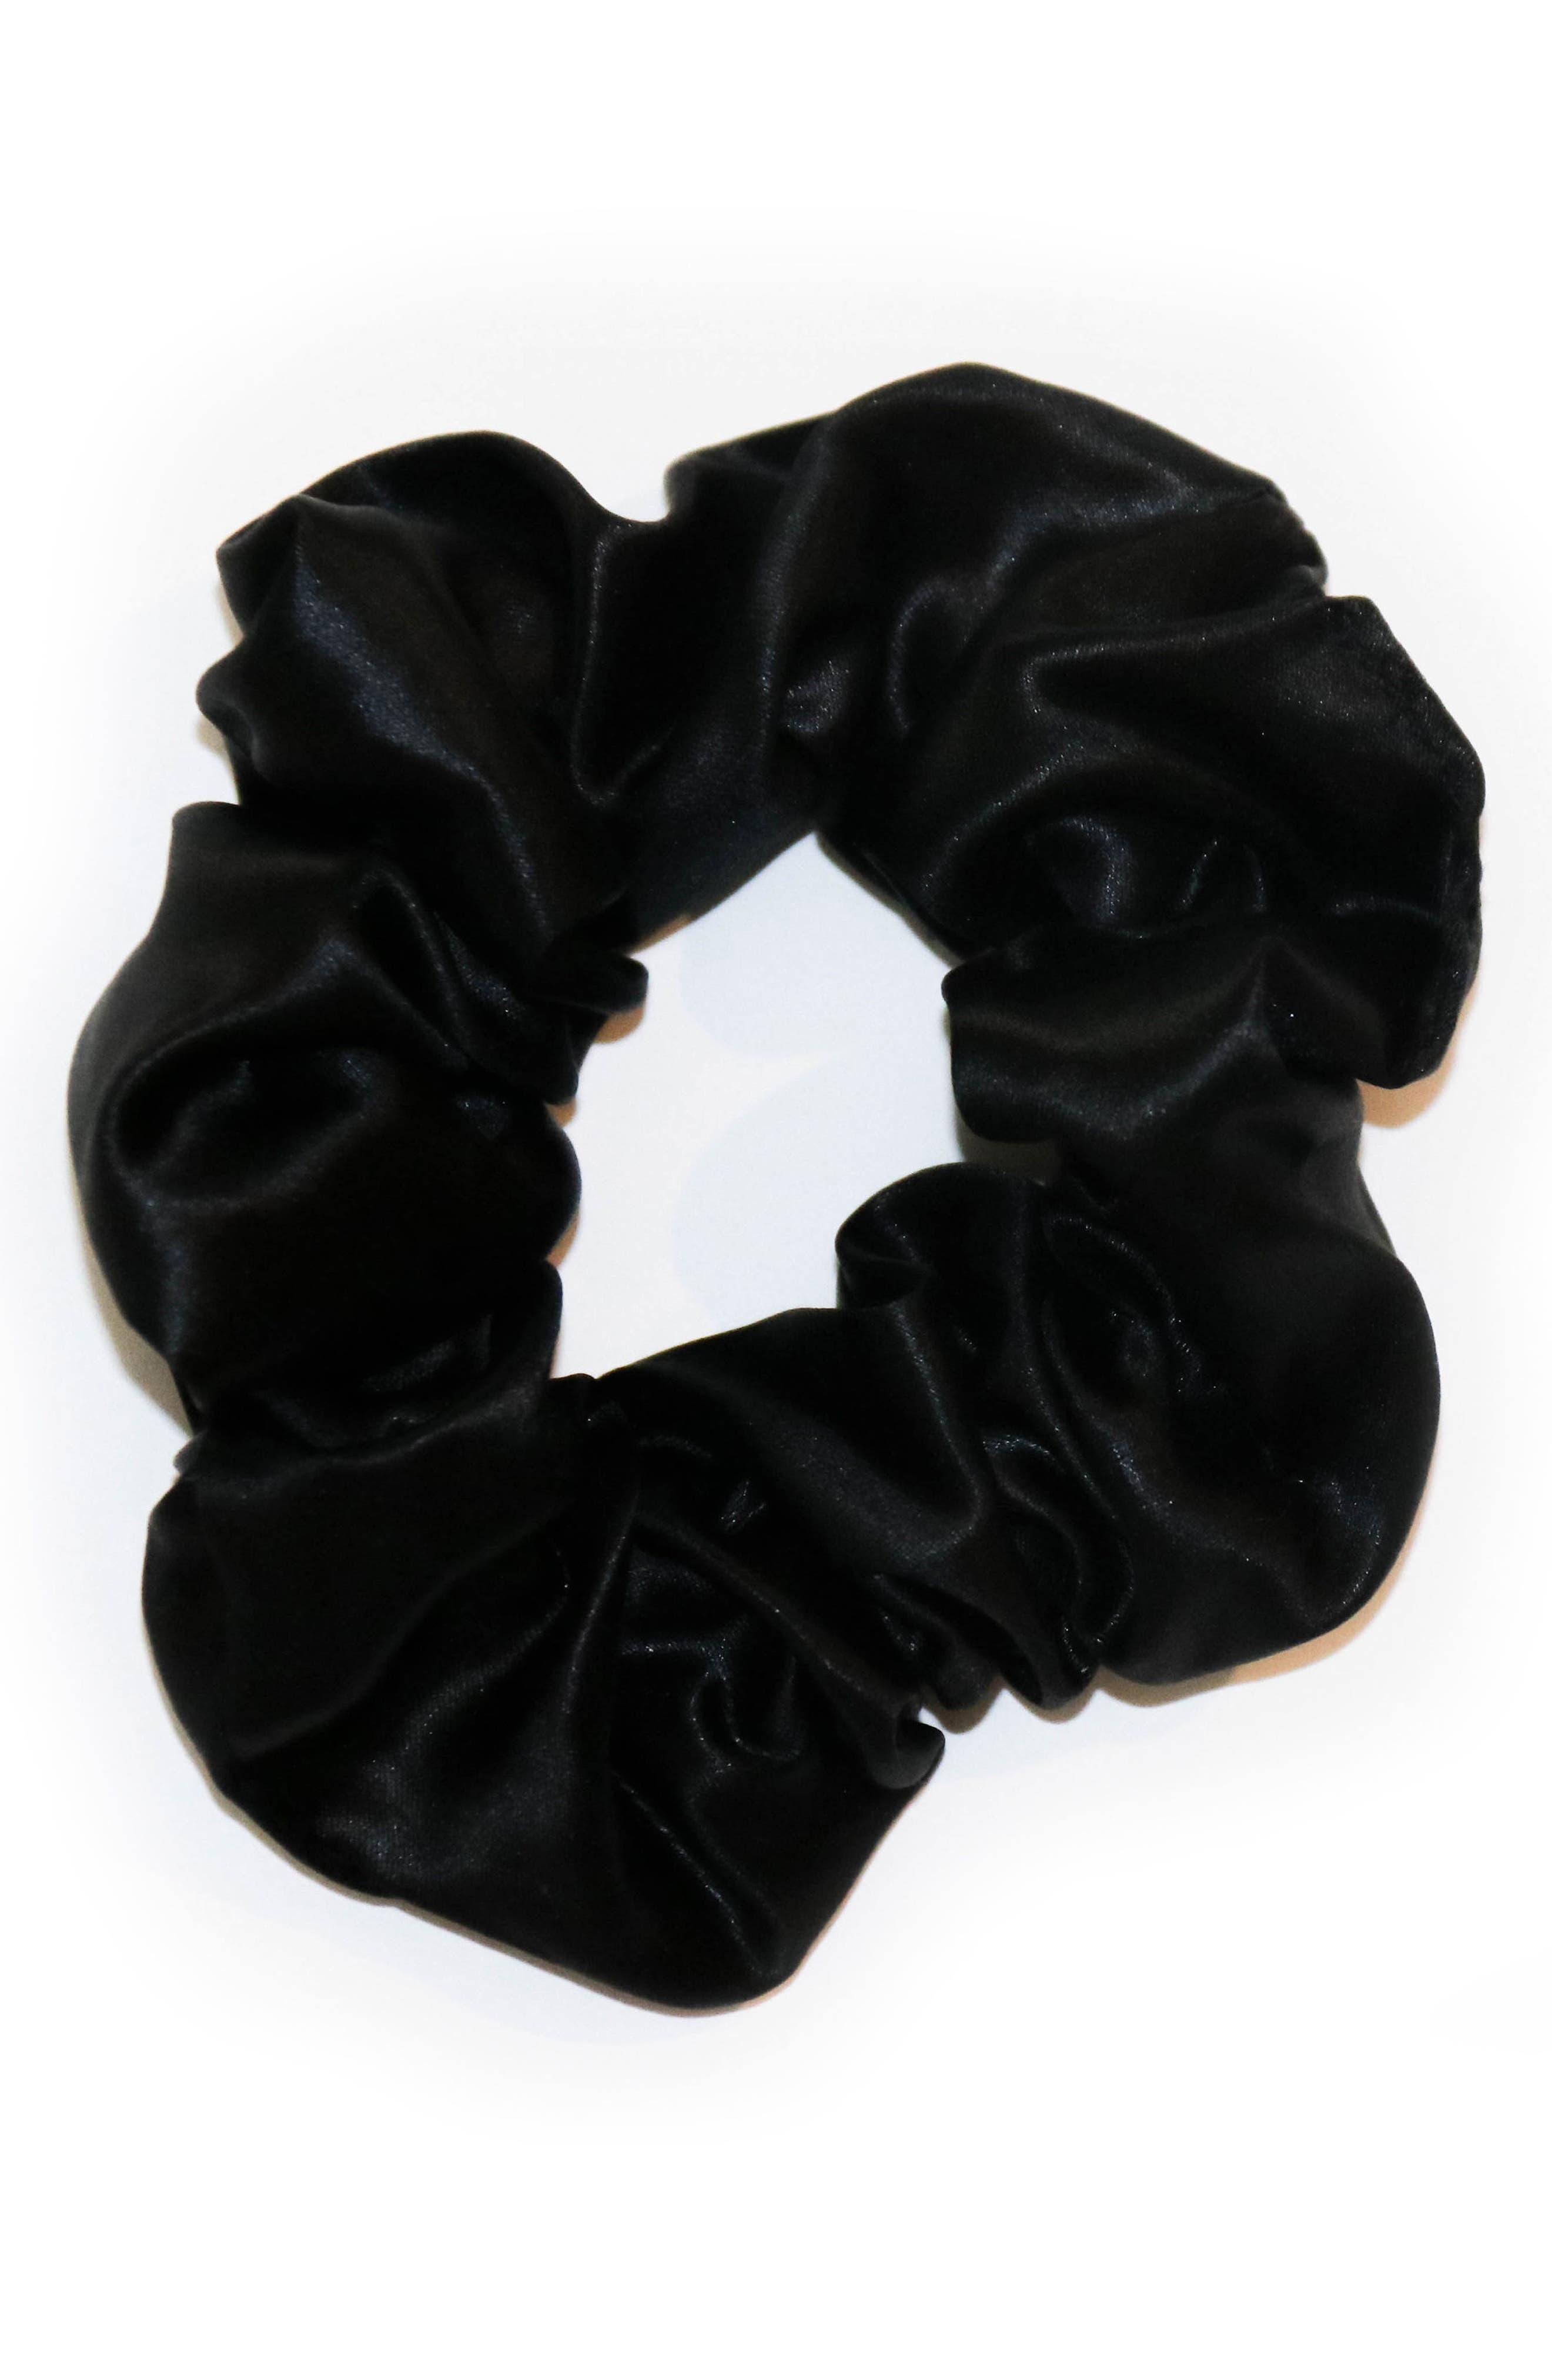 slip<sup>™</sup> for beauty sleep 3-Pack Slipsilk<sup>™</sup> Hair Ties,                             Alternate thumbnail 2, color,                             Black